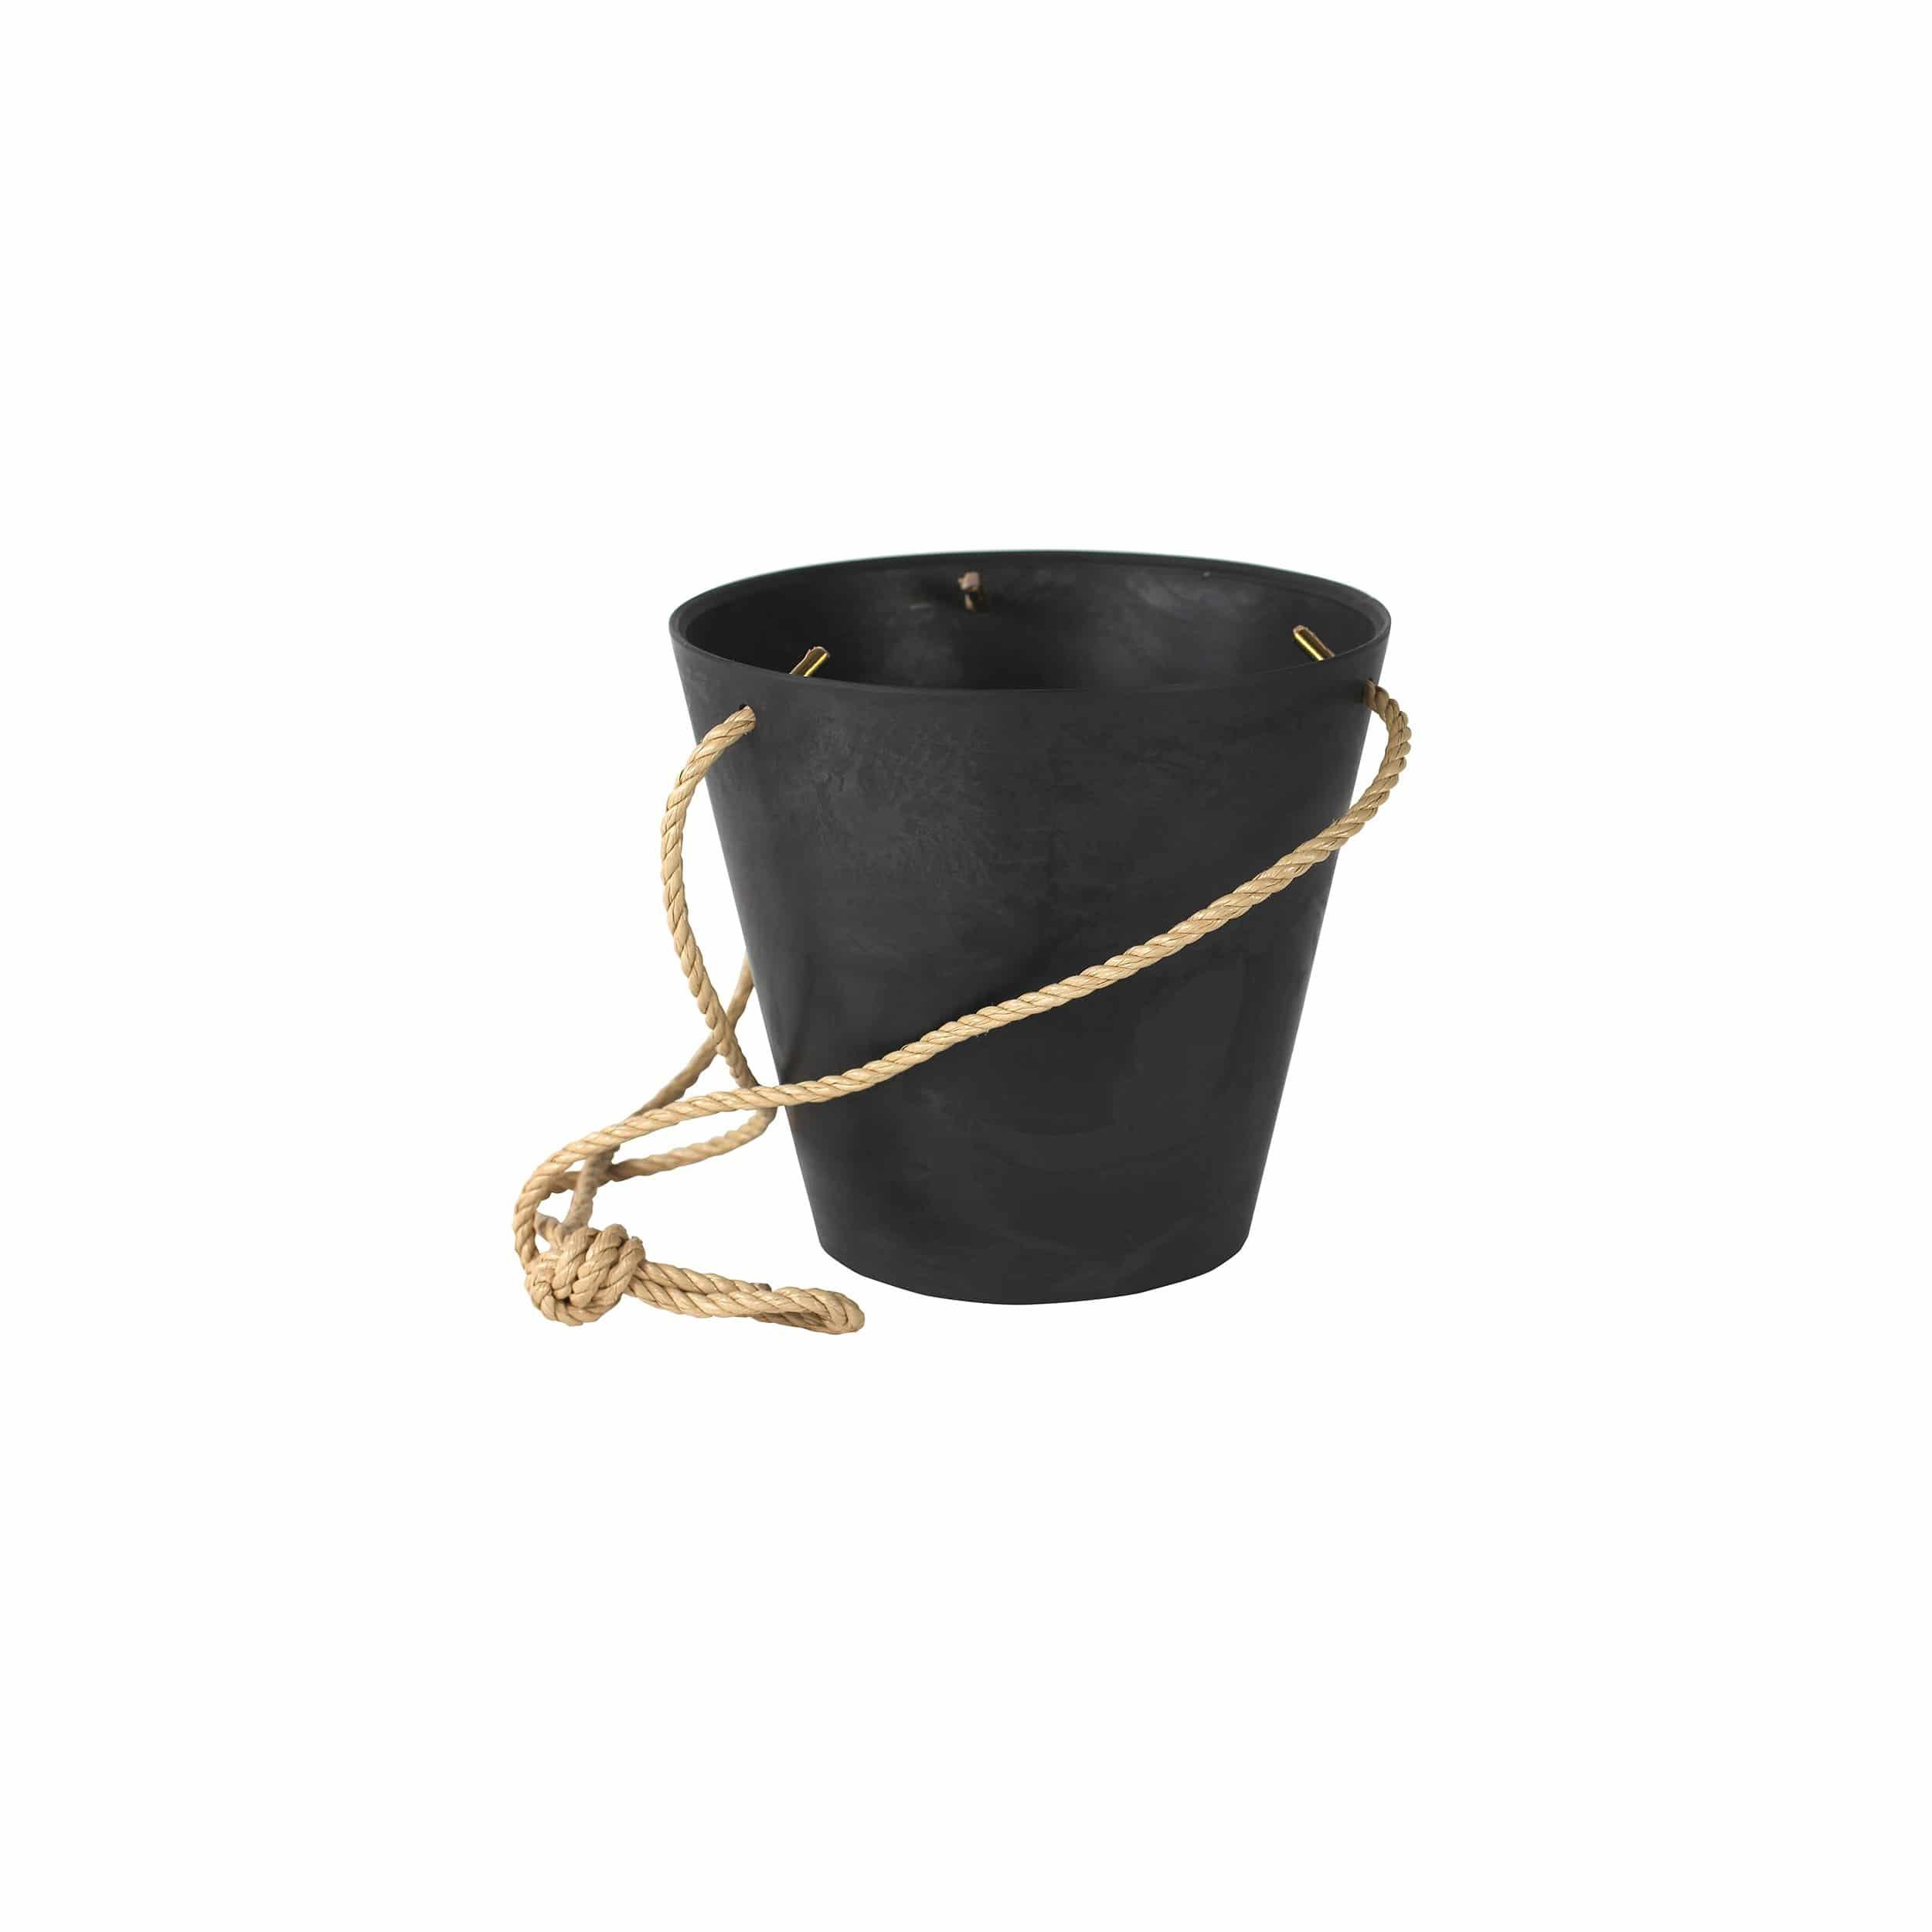 Hänge-Blumentopf Claire D22cm schwarz